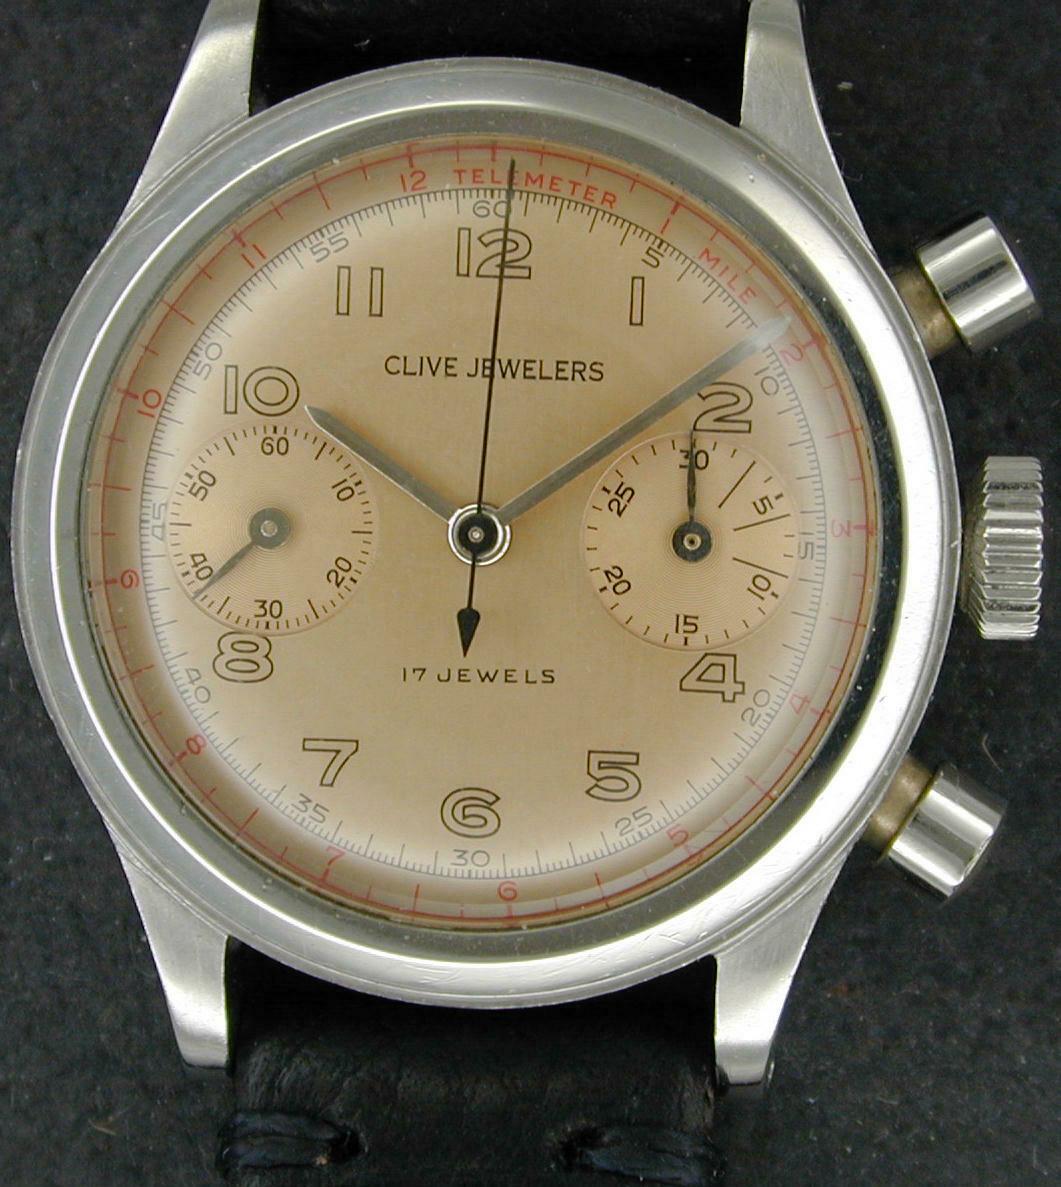 Clive Jewelers Chronograph Valjoux 23